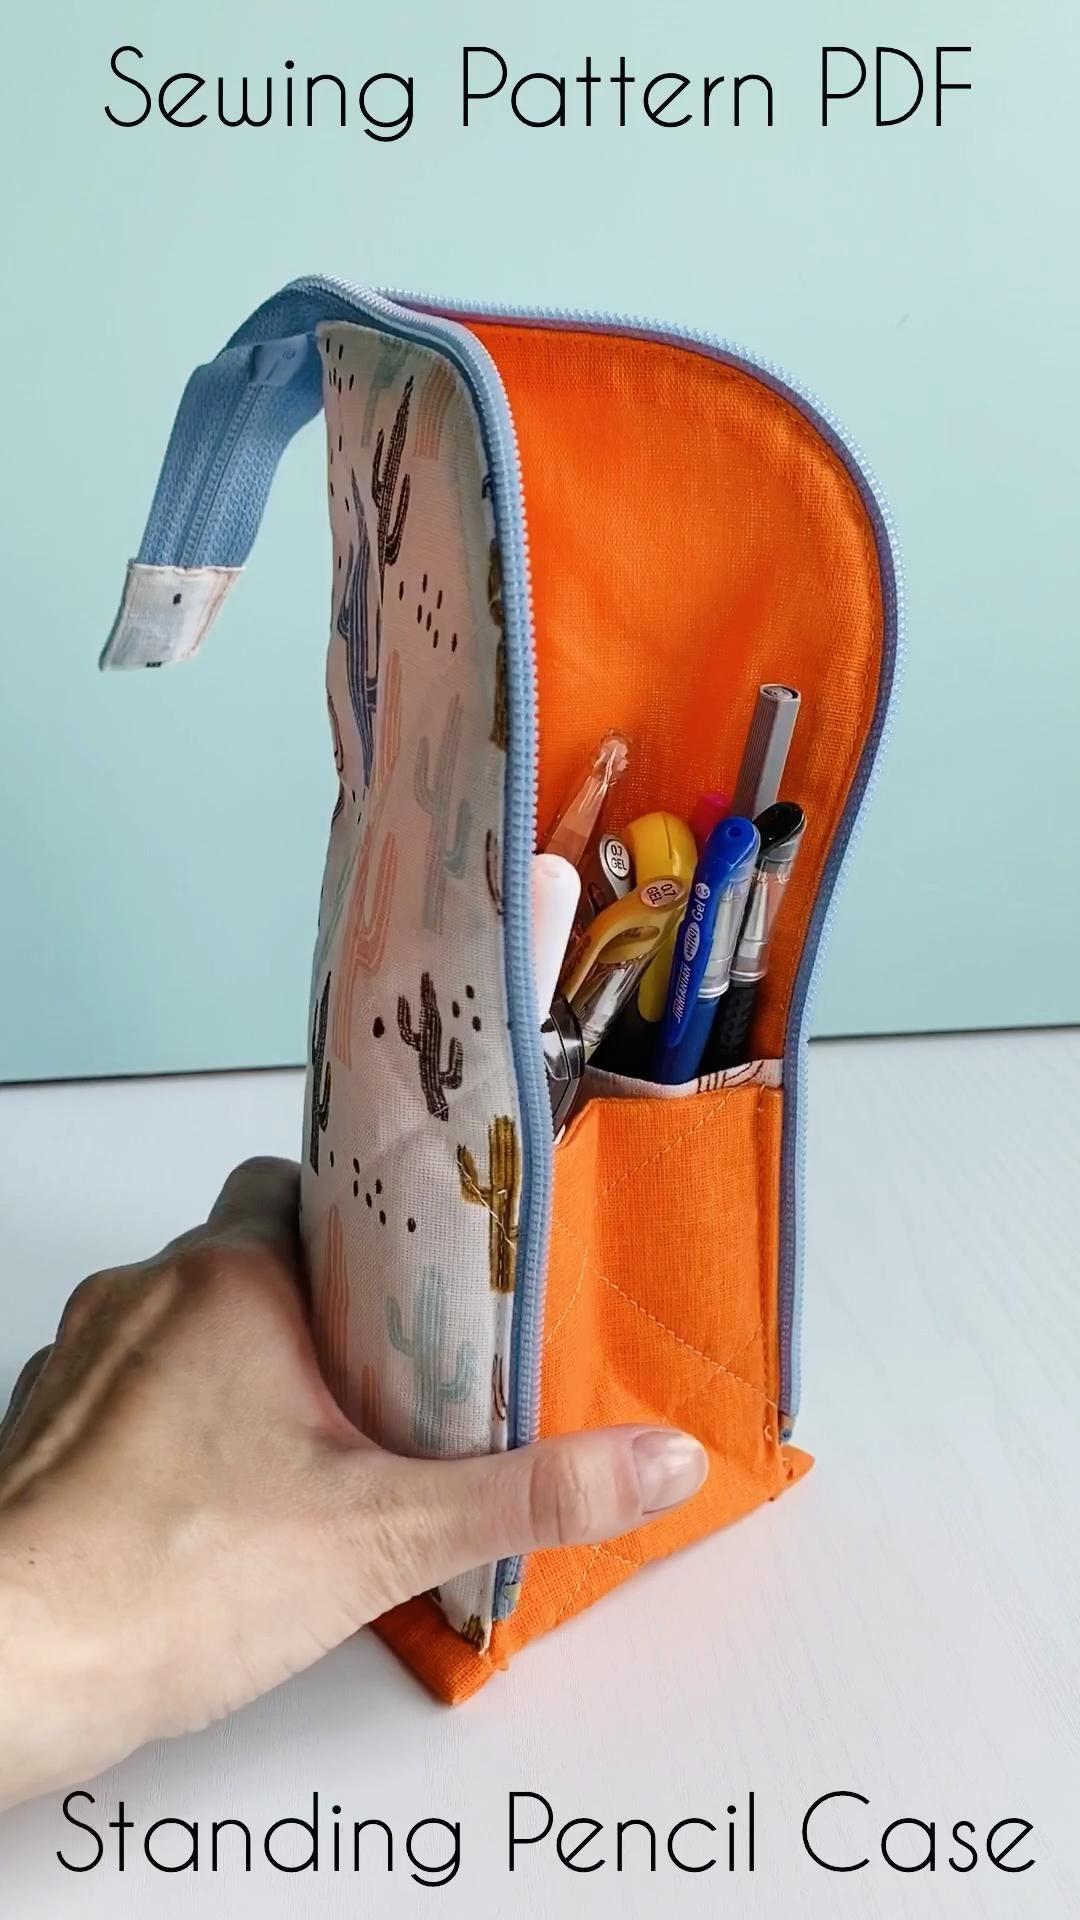 Standing pencil case PATTERN, Pencil holder, Zipper pencil case DIY, Cute pen pouch, zipper